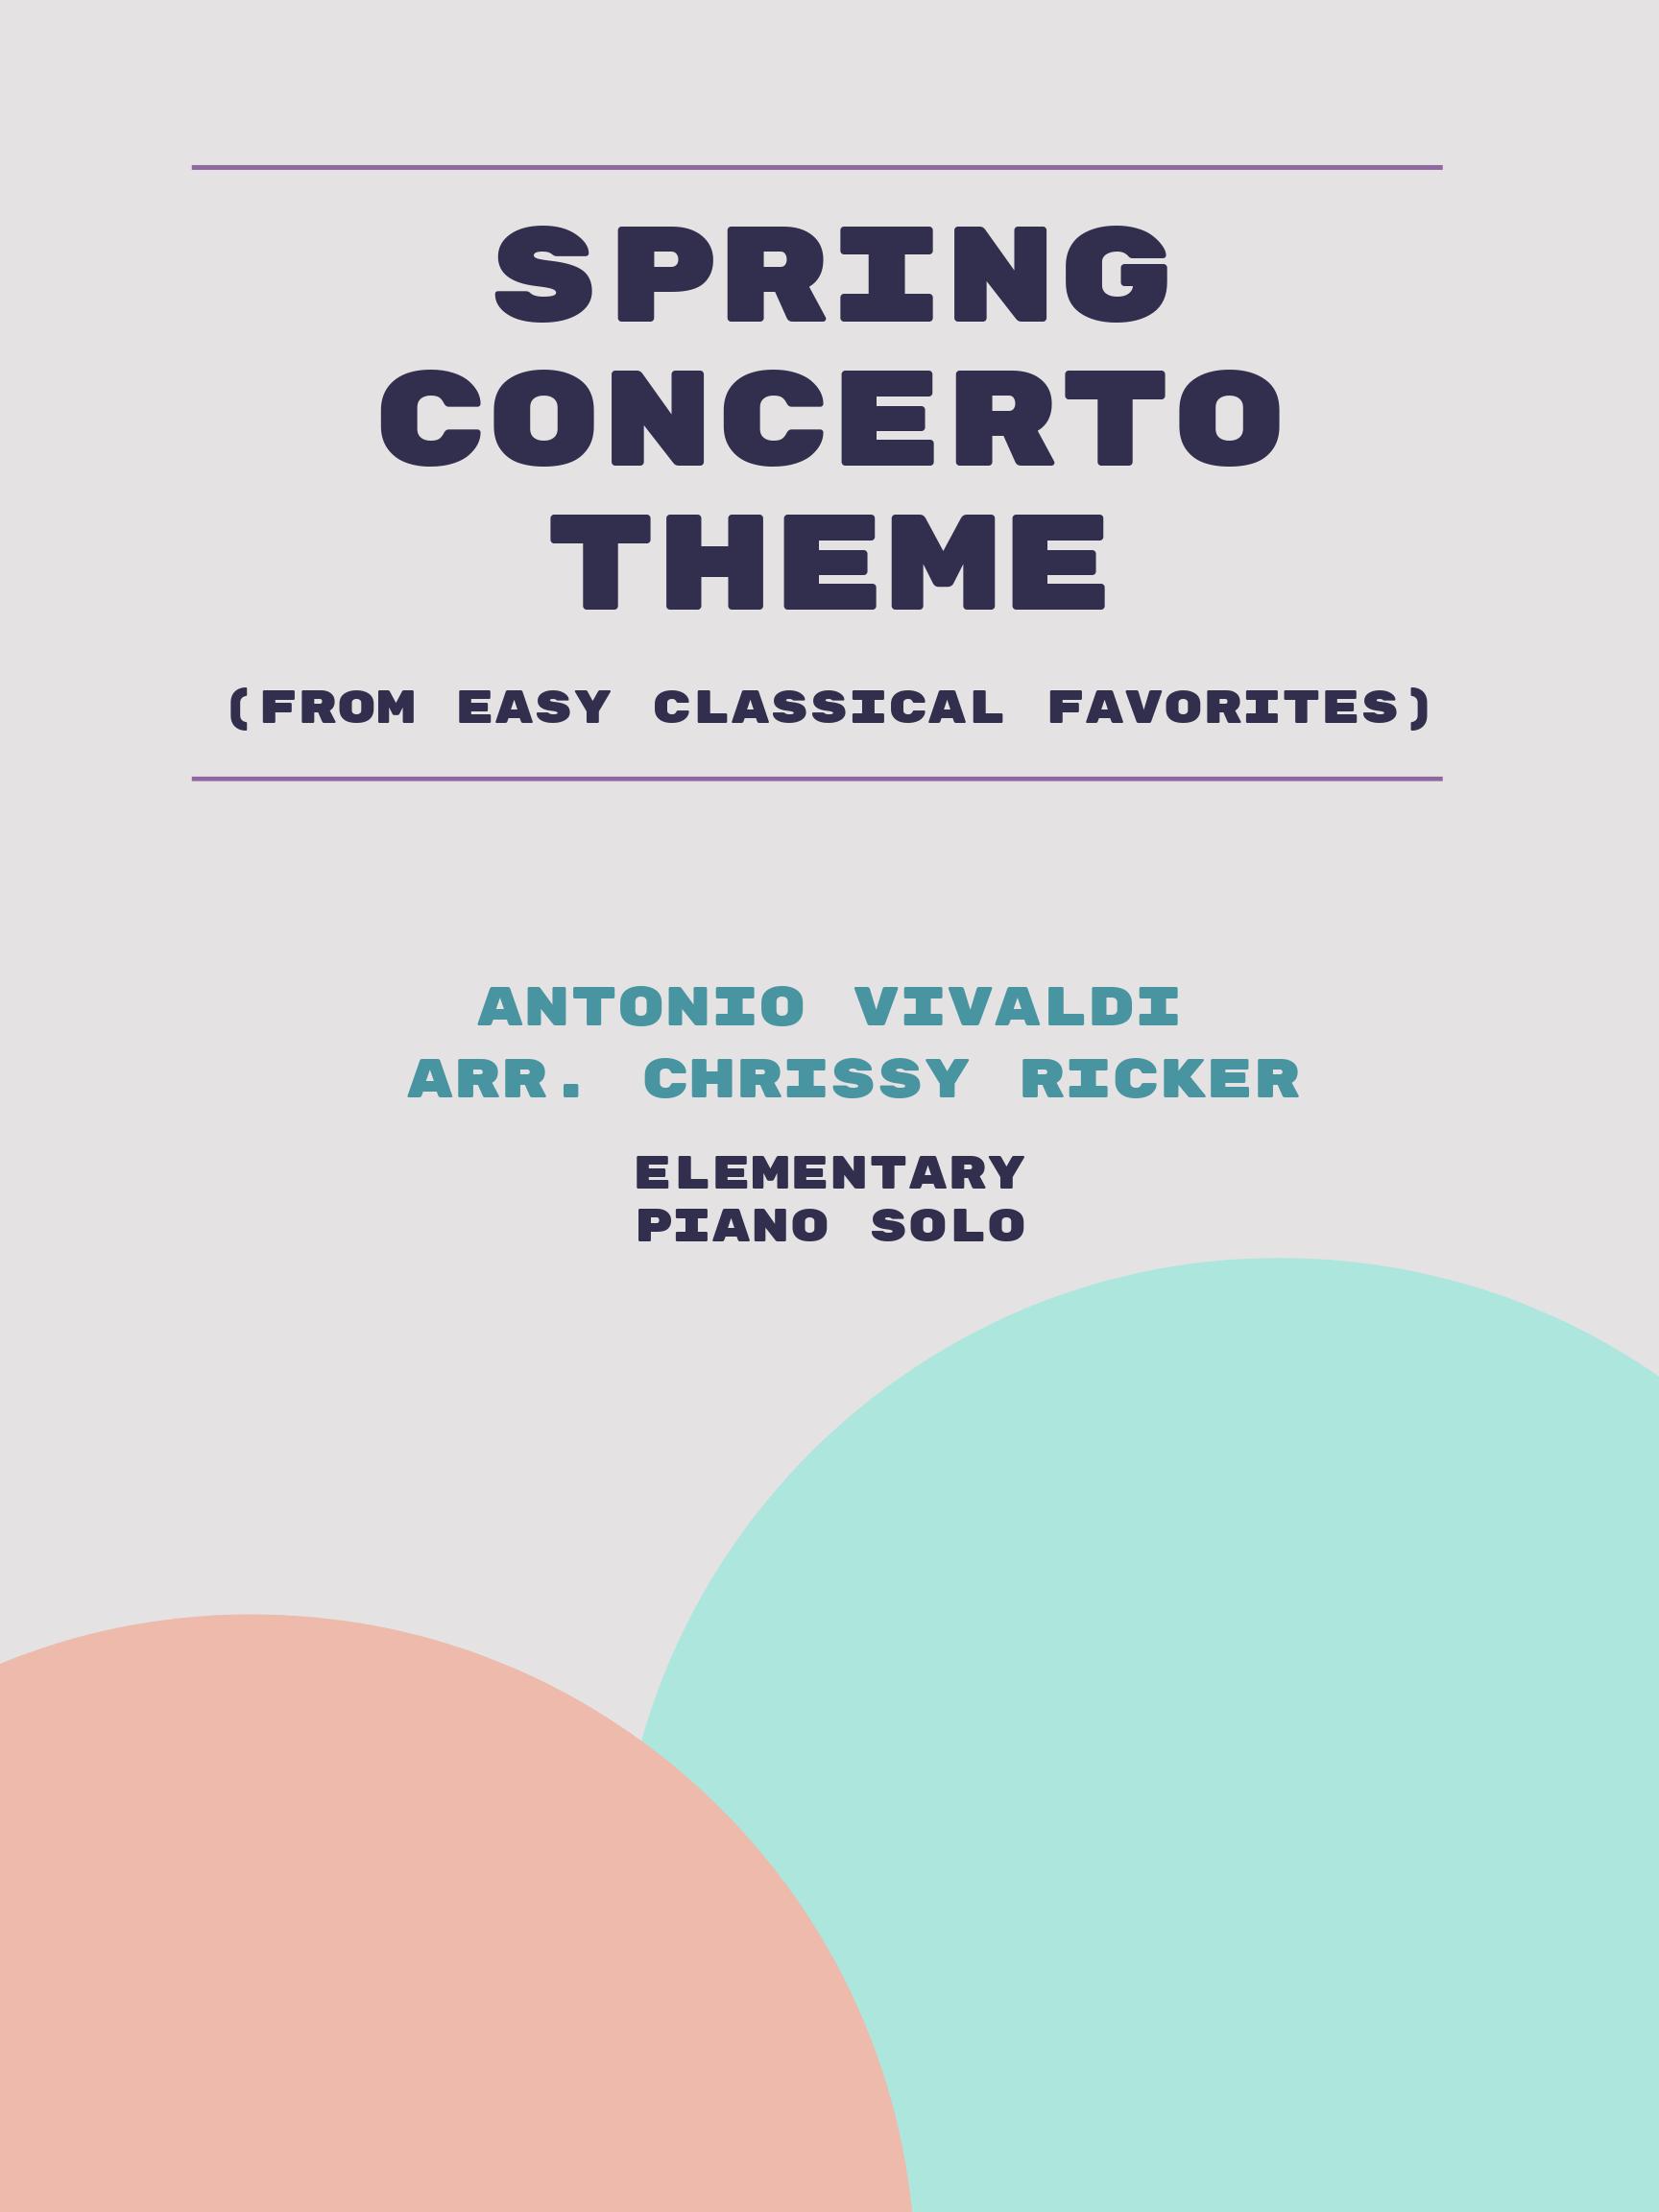 Spring Concerto Theme by Antonio Vivaldi